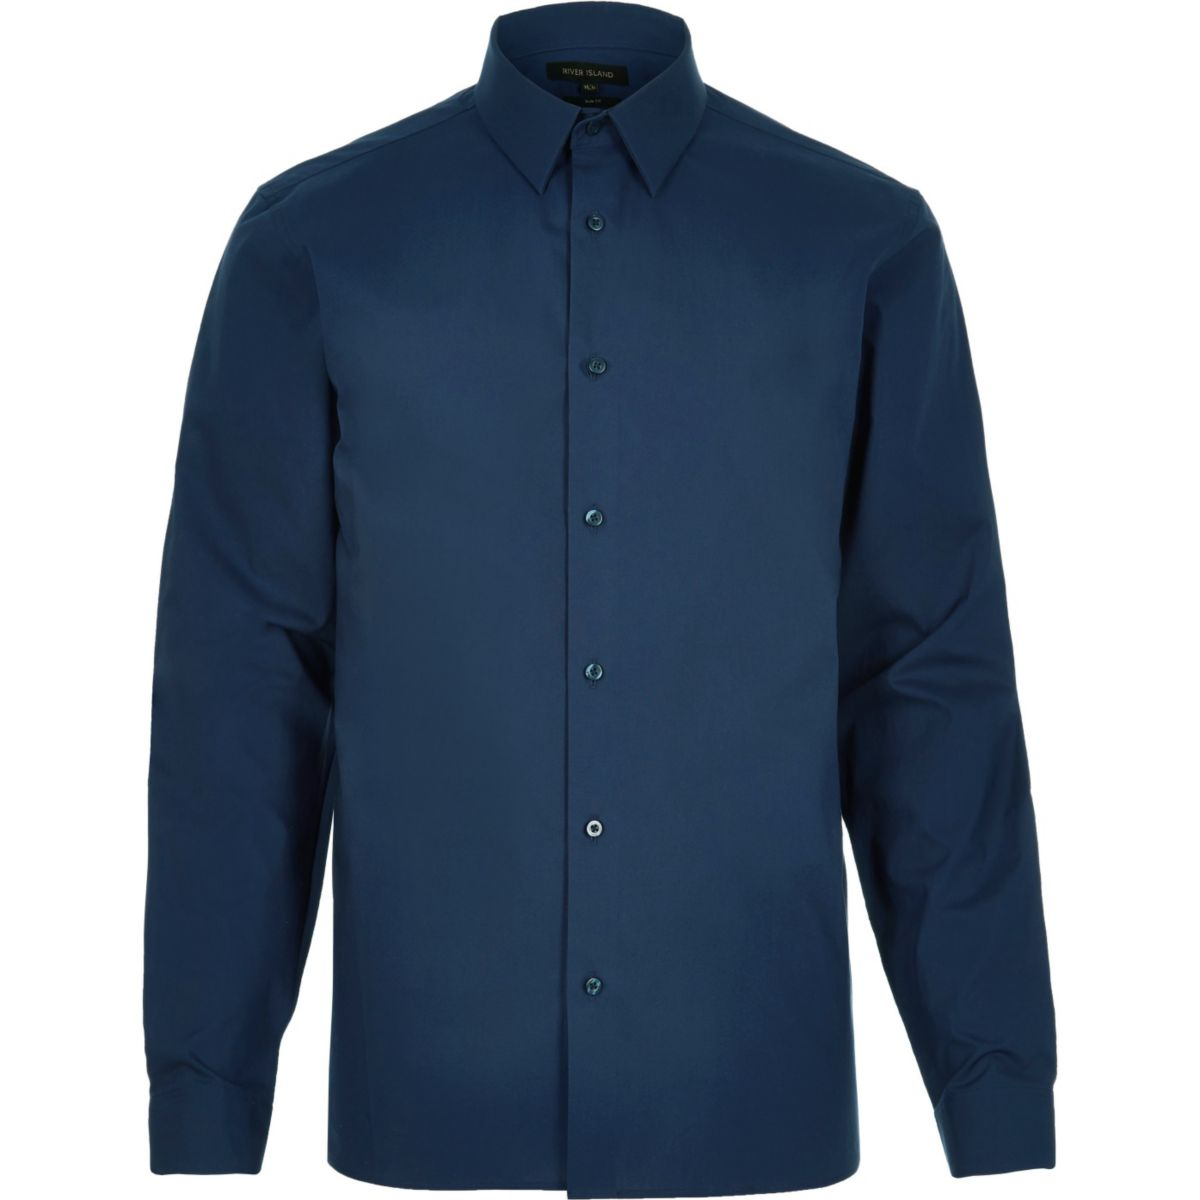 Navy formal slim fit poplin shirt shirts sale men for Navy slim fit shirt